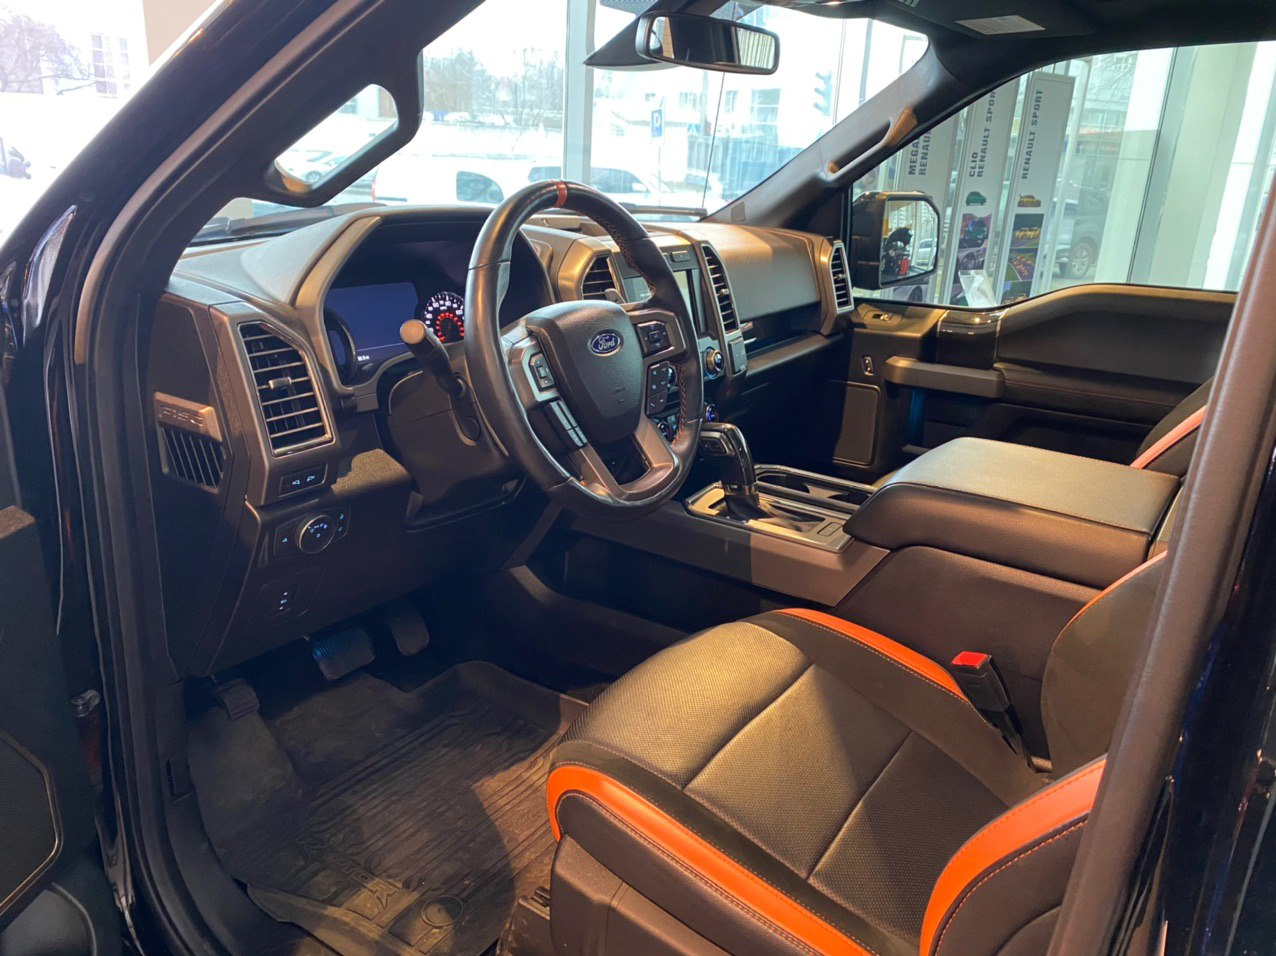 2018 Ford F150 | Vin: 1FTFW1RG9JFA12452